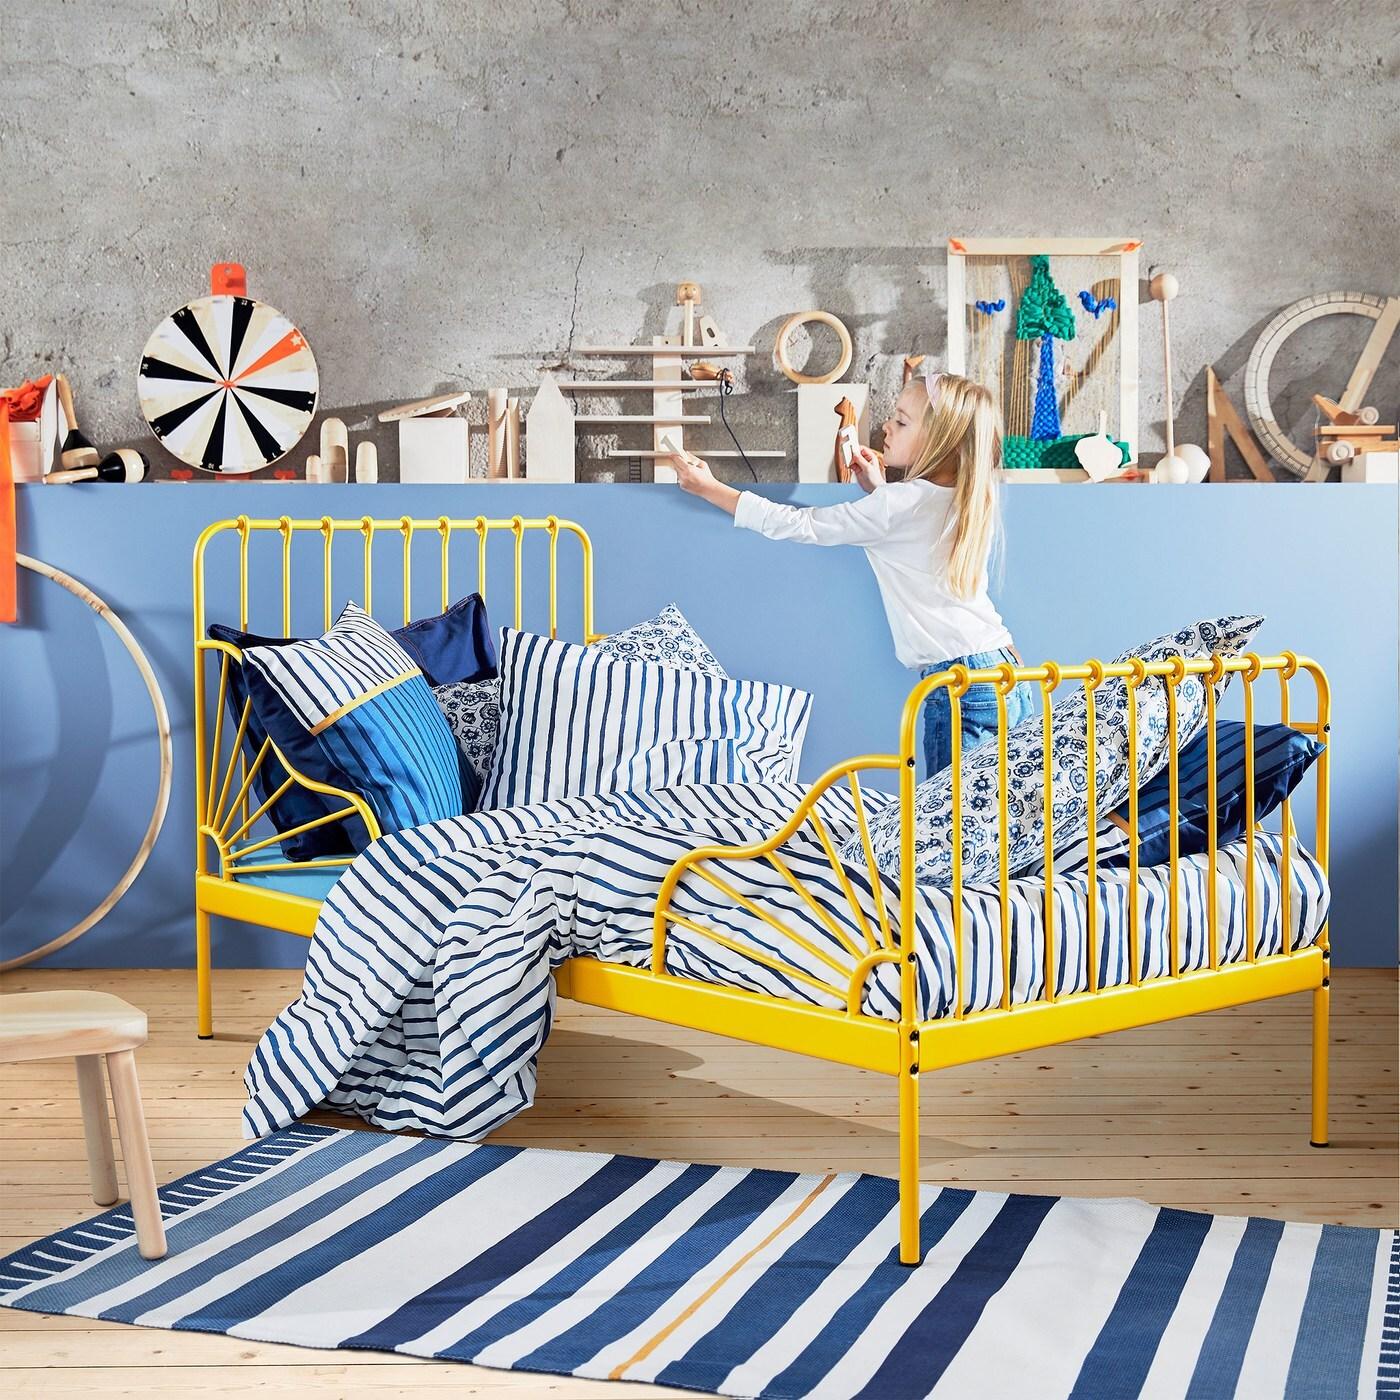 A Bright Idea For Children S Beds Ikea